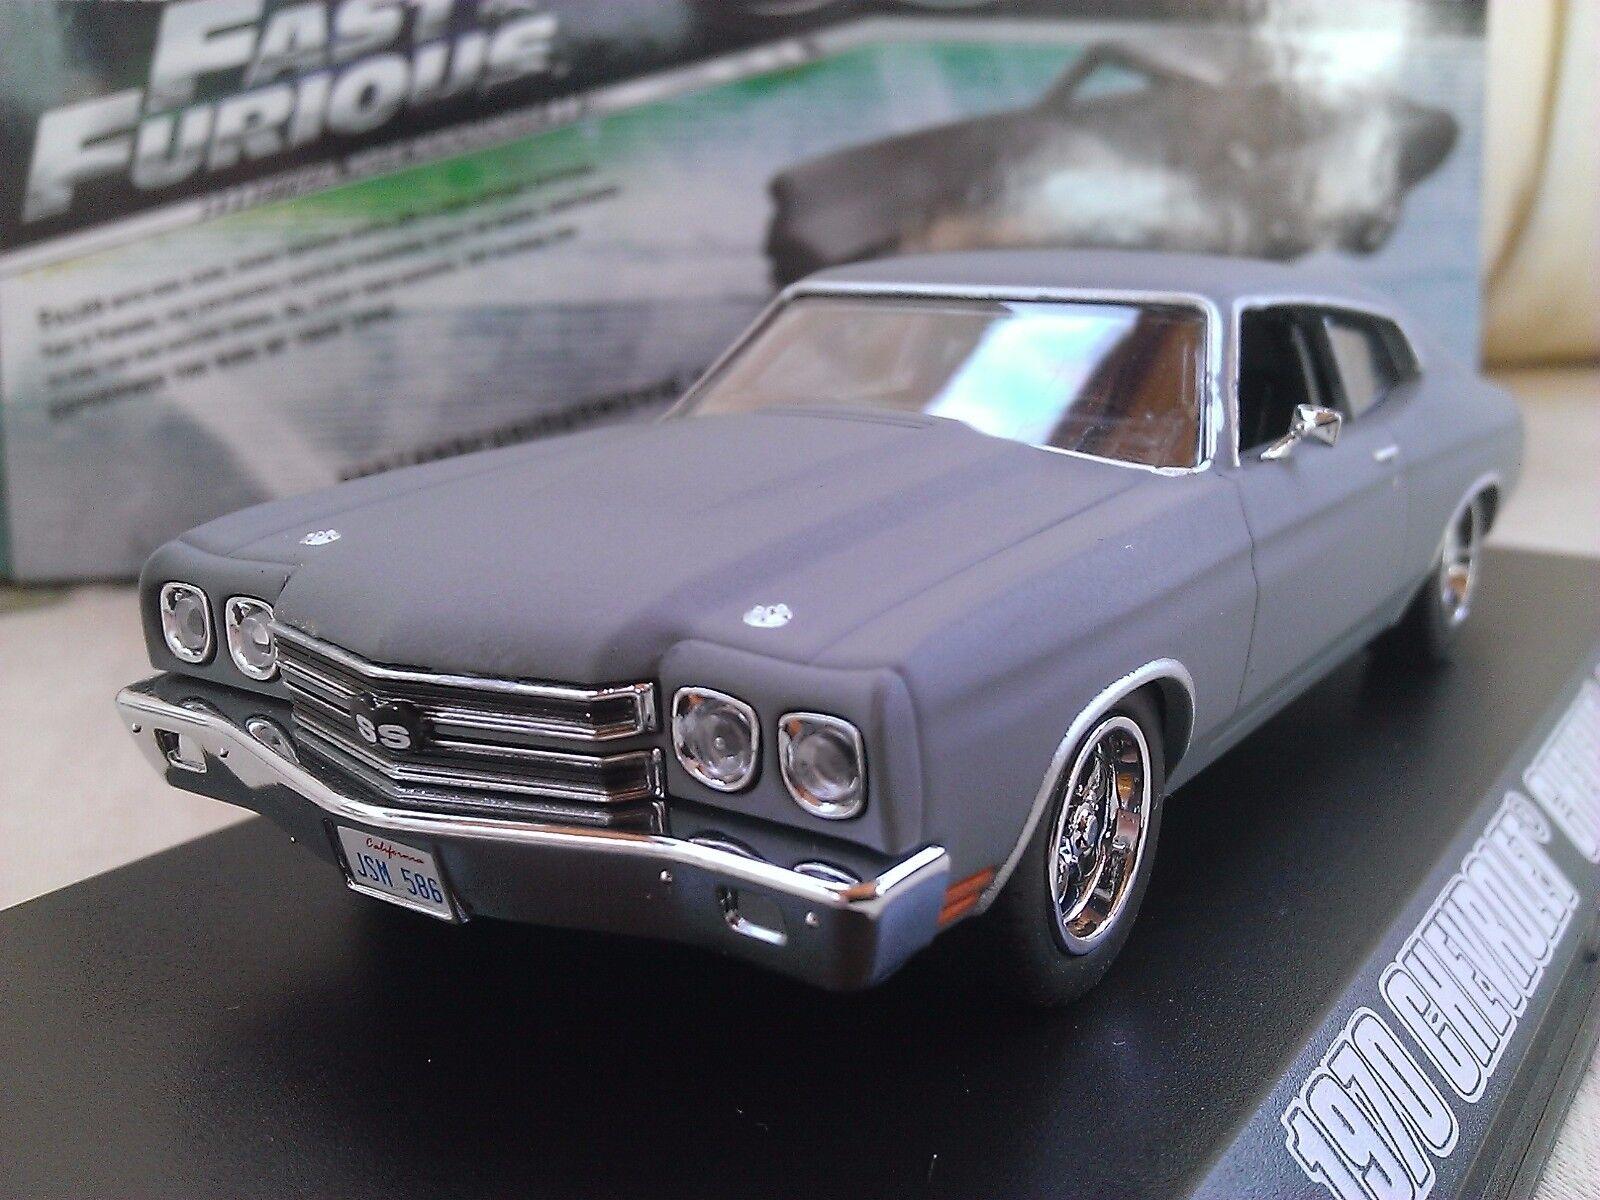 Fast and Furious De Dom 1970 Chevrolet Chevelle SS Voiture Miniature 1 43